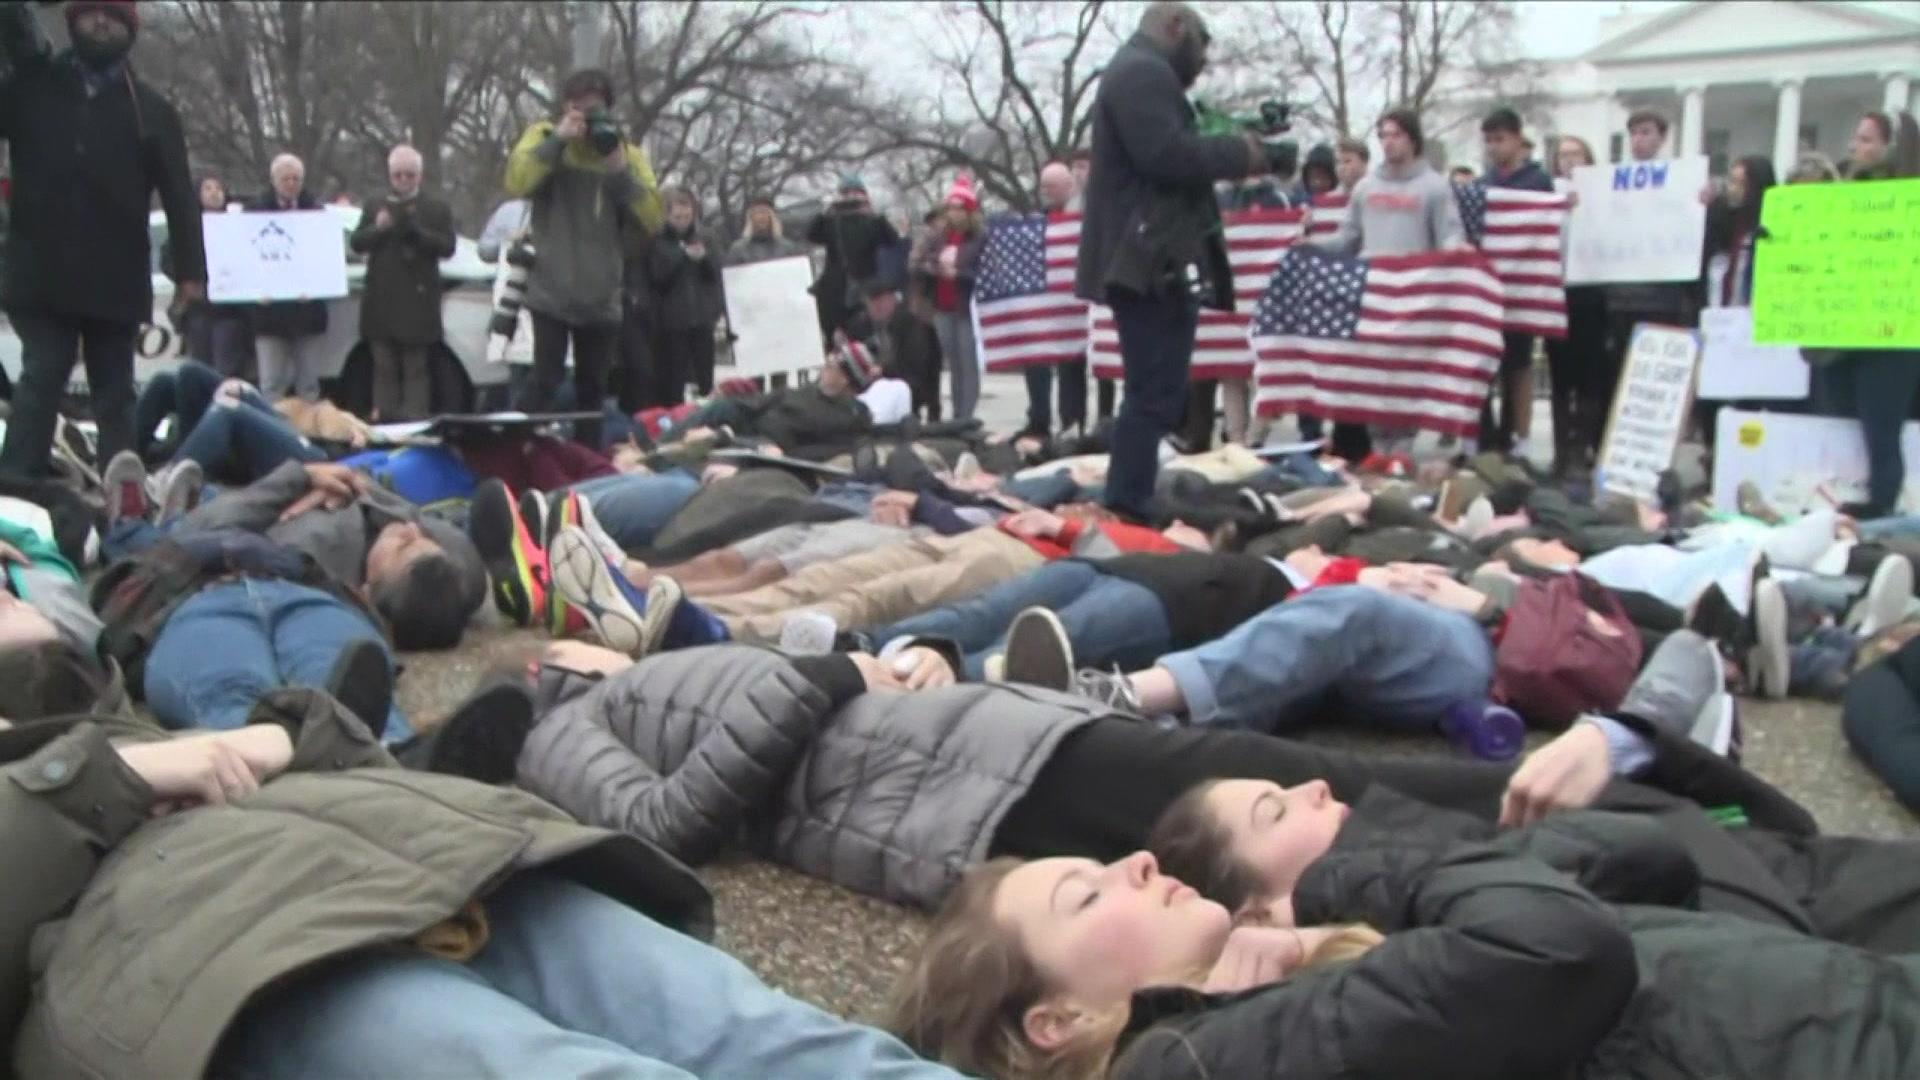 9747392_thjo_us_anti-gun_student_protest-18.23.32.20_0.jpg